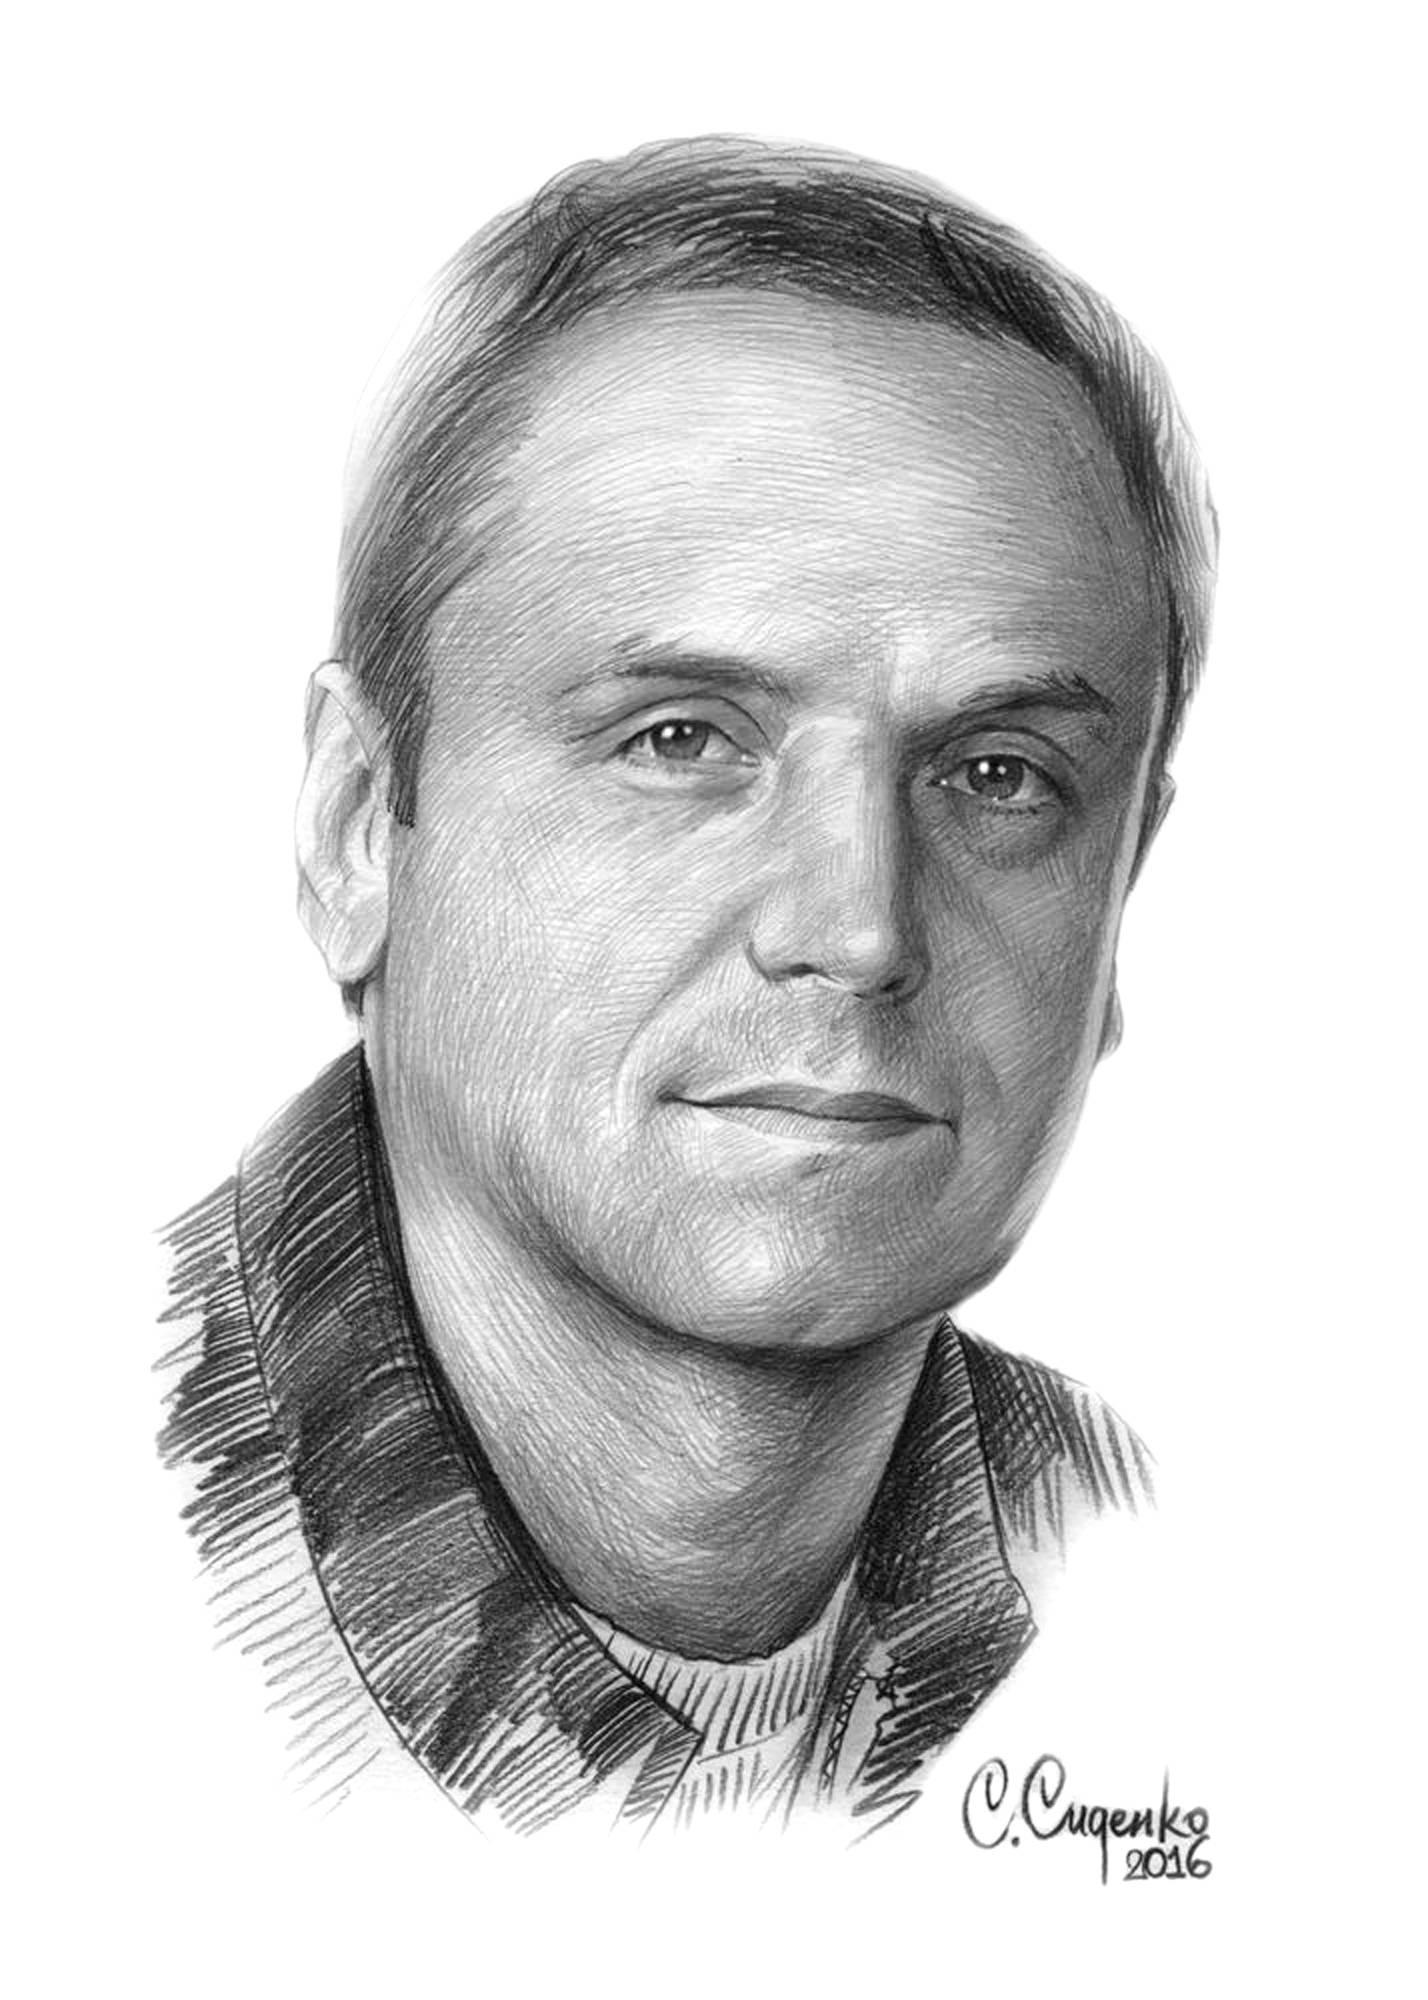 """Портрет А.Соколова"" (бумага/карандаш) 20х30см, 2016 г."